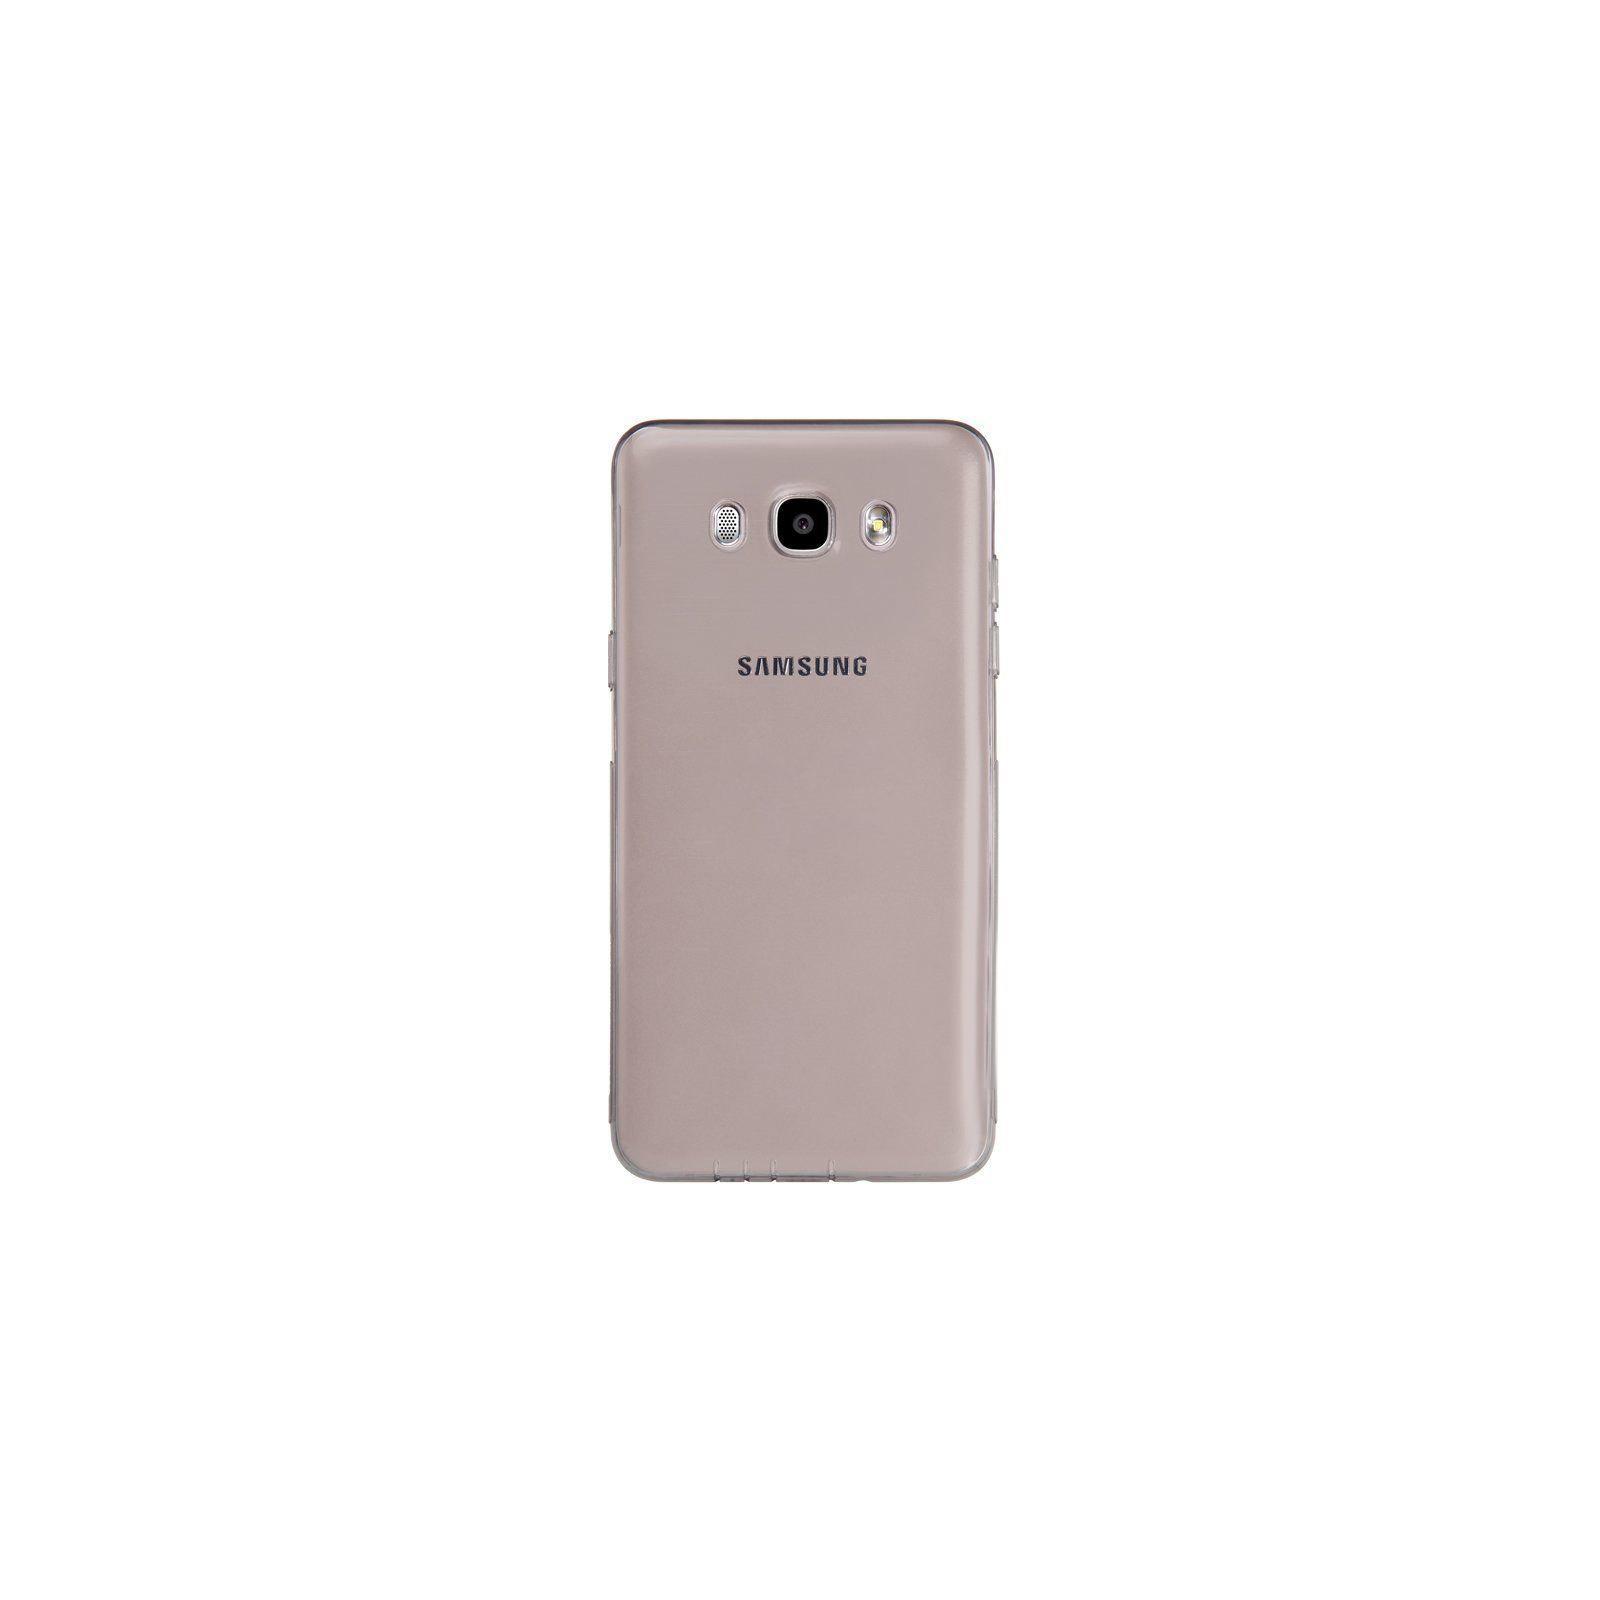 Чехол для моб. телефона SmartCase Samsung Galaxy J5 / J510 TPU Clear (SC-J510) изображение 3